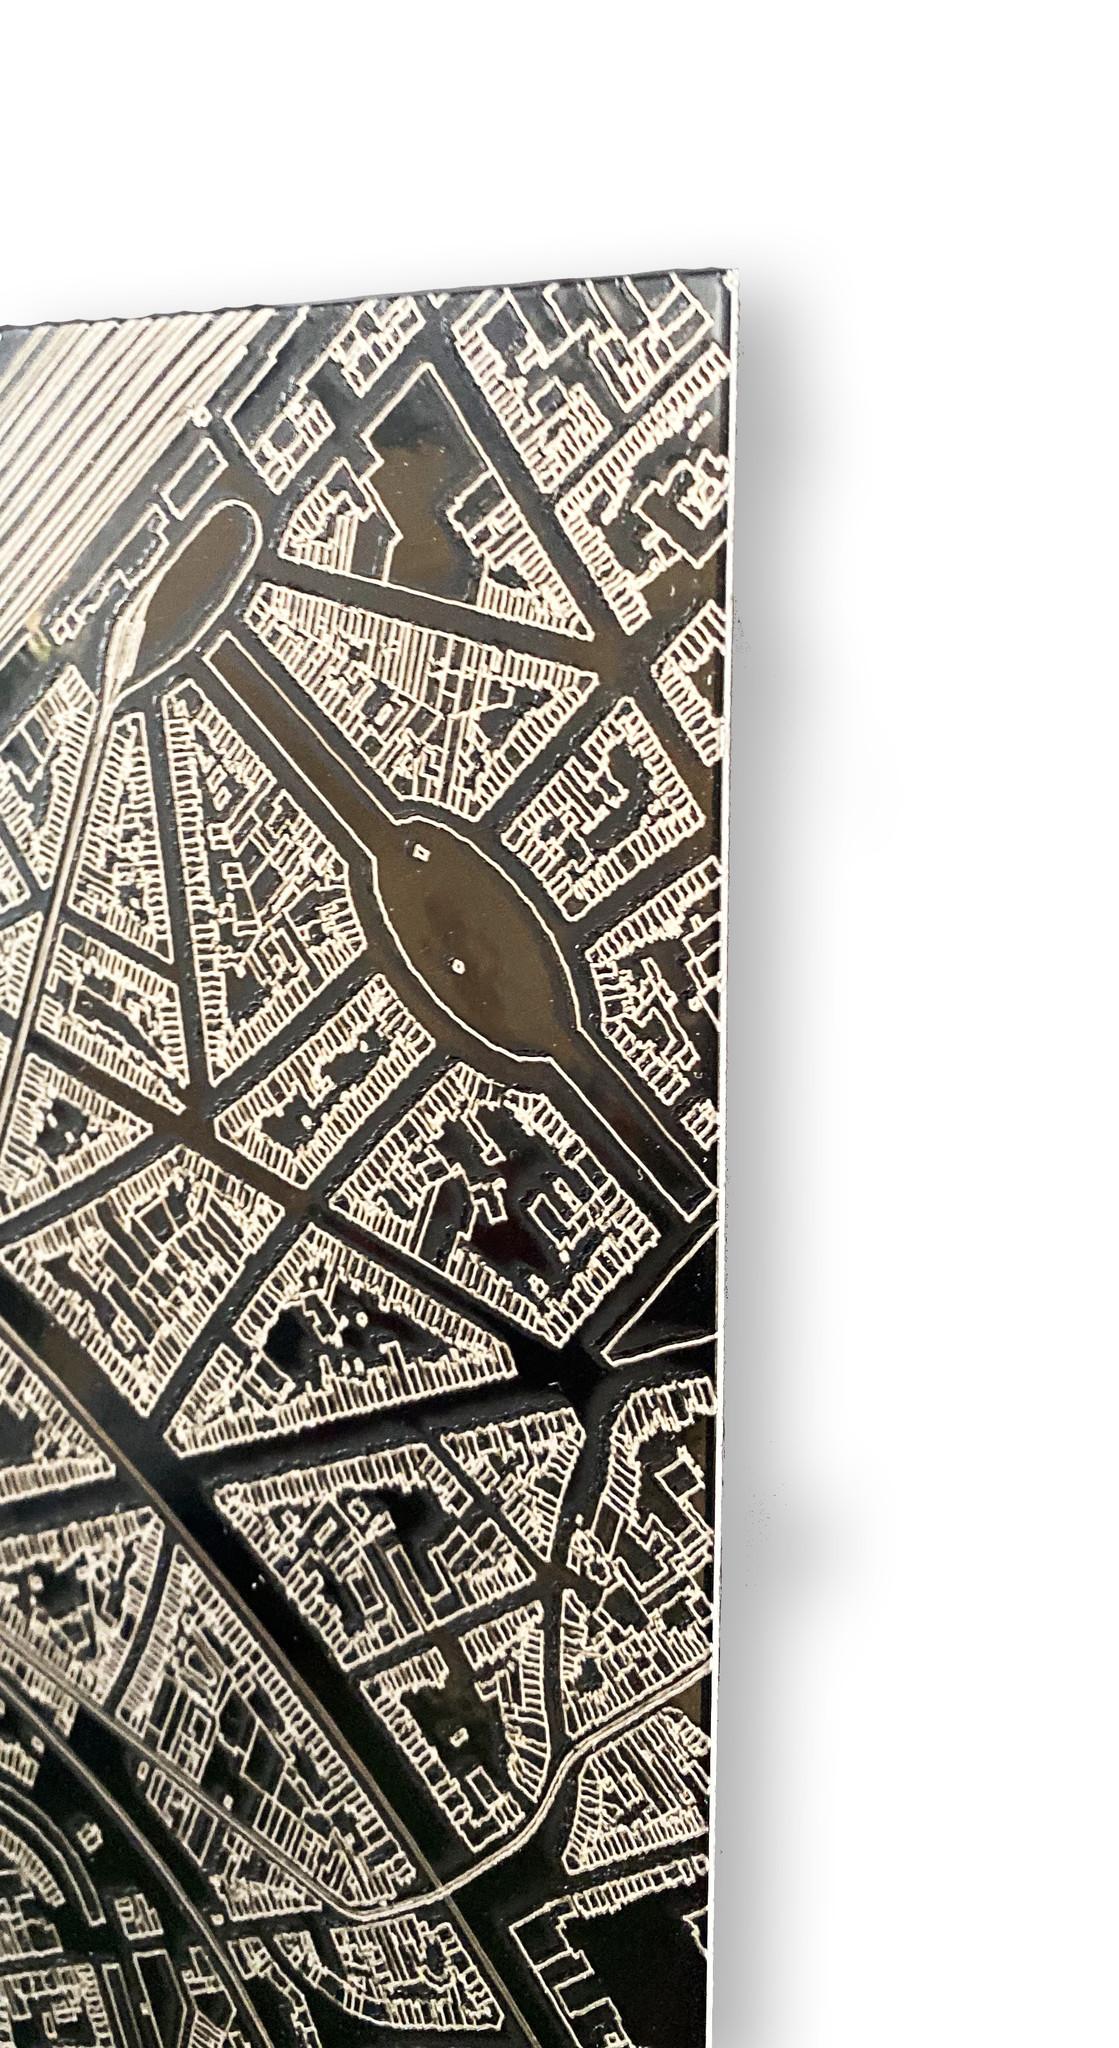 Stadtkarte Metal Amersfoort-6